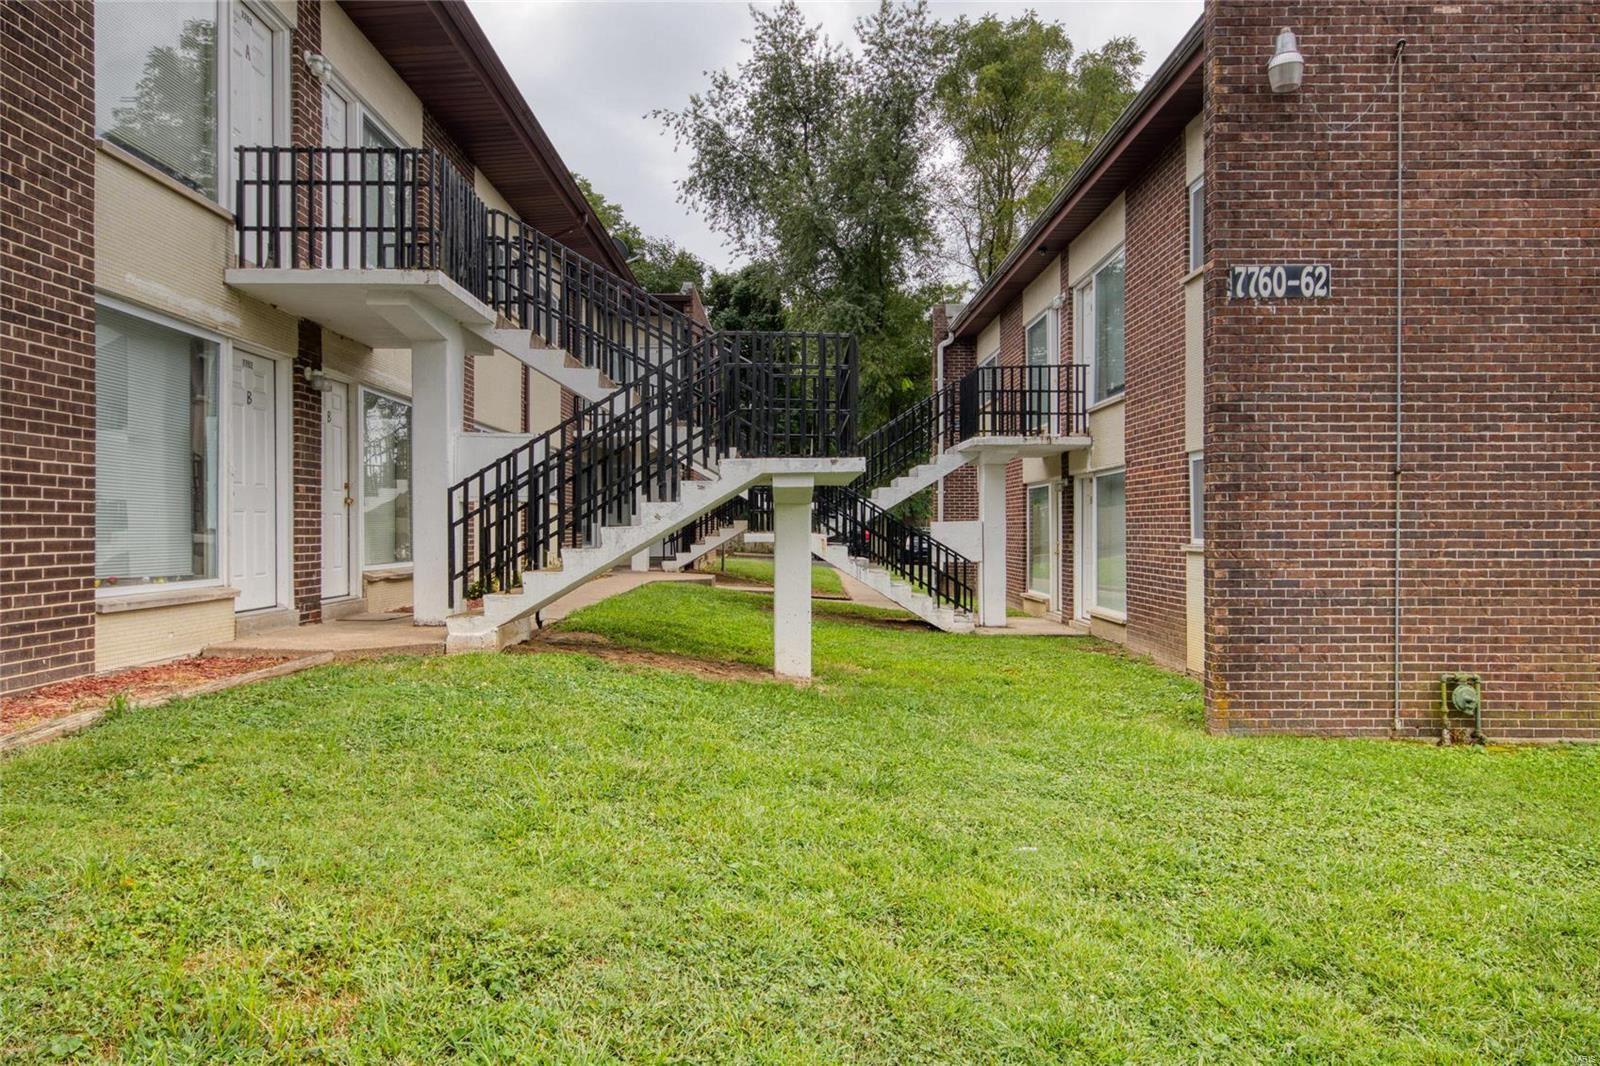 7752 Woodstock Road, Normandy, MO 63135 - MLS#: 20064690